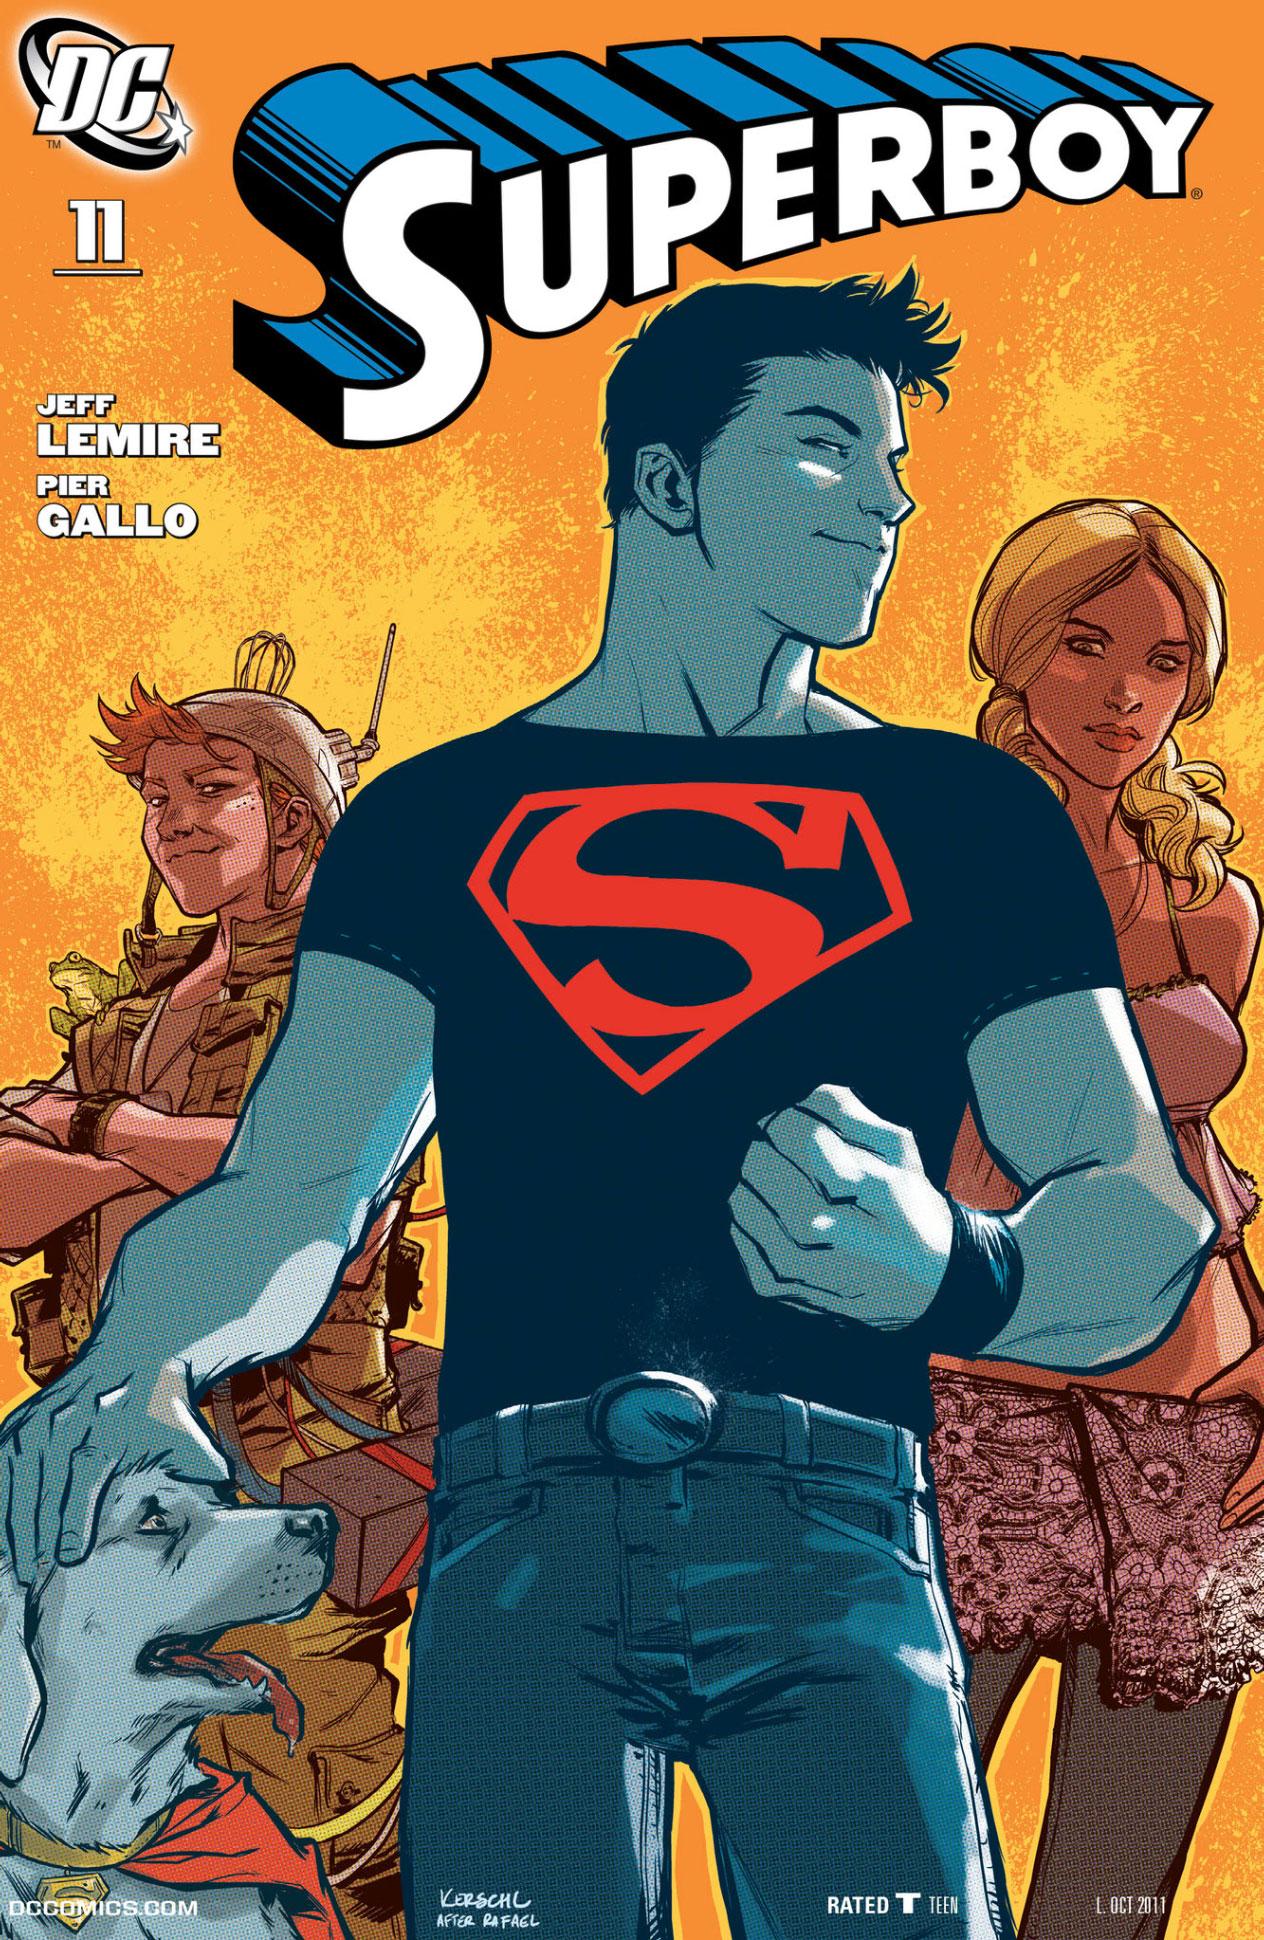 Why-It's-Satisfying-Superboy.jpg